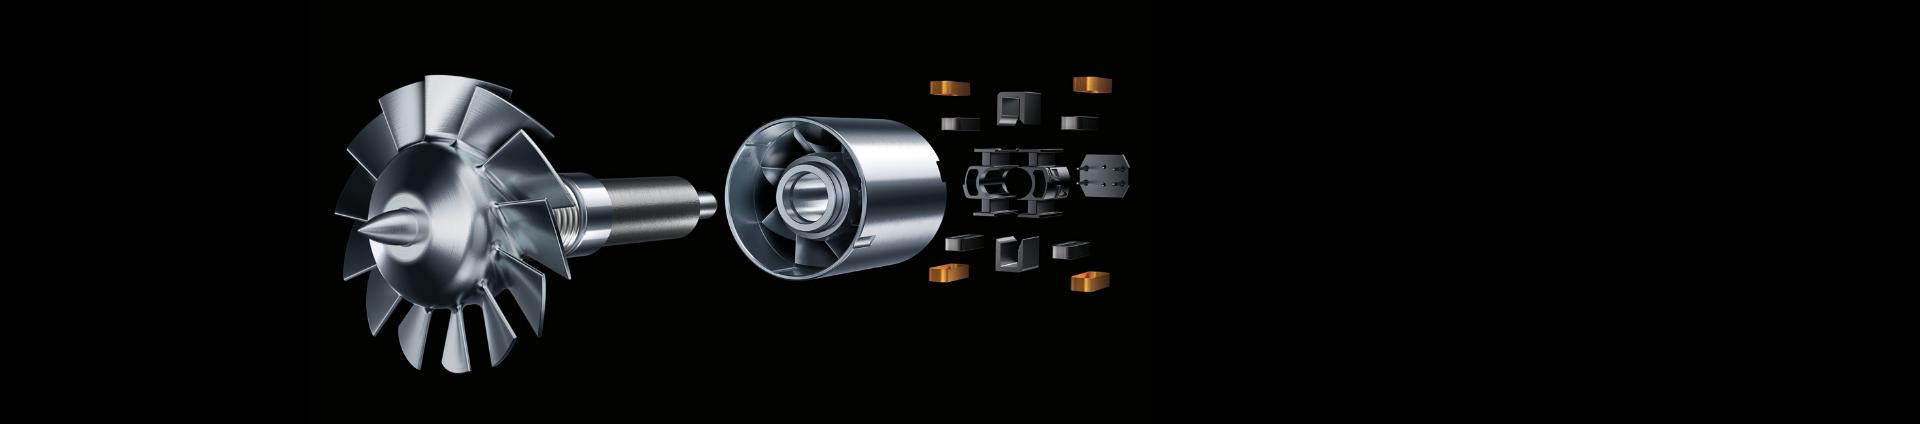 محرك دايسون الرقمي V9